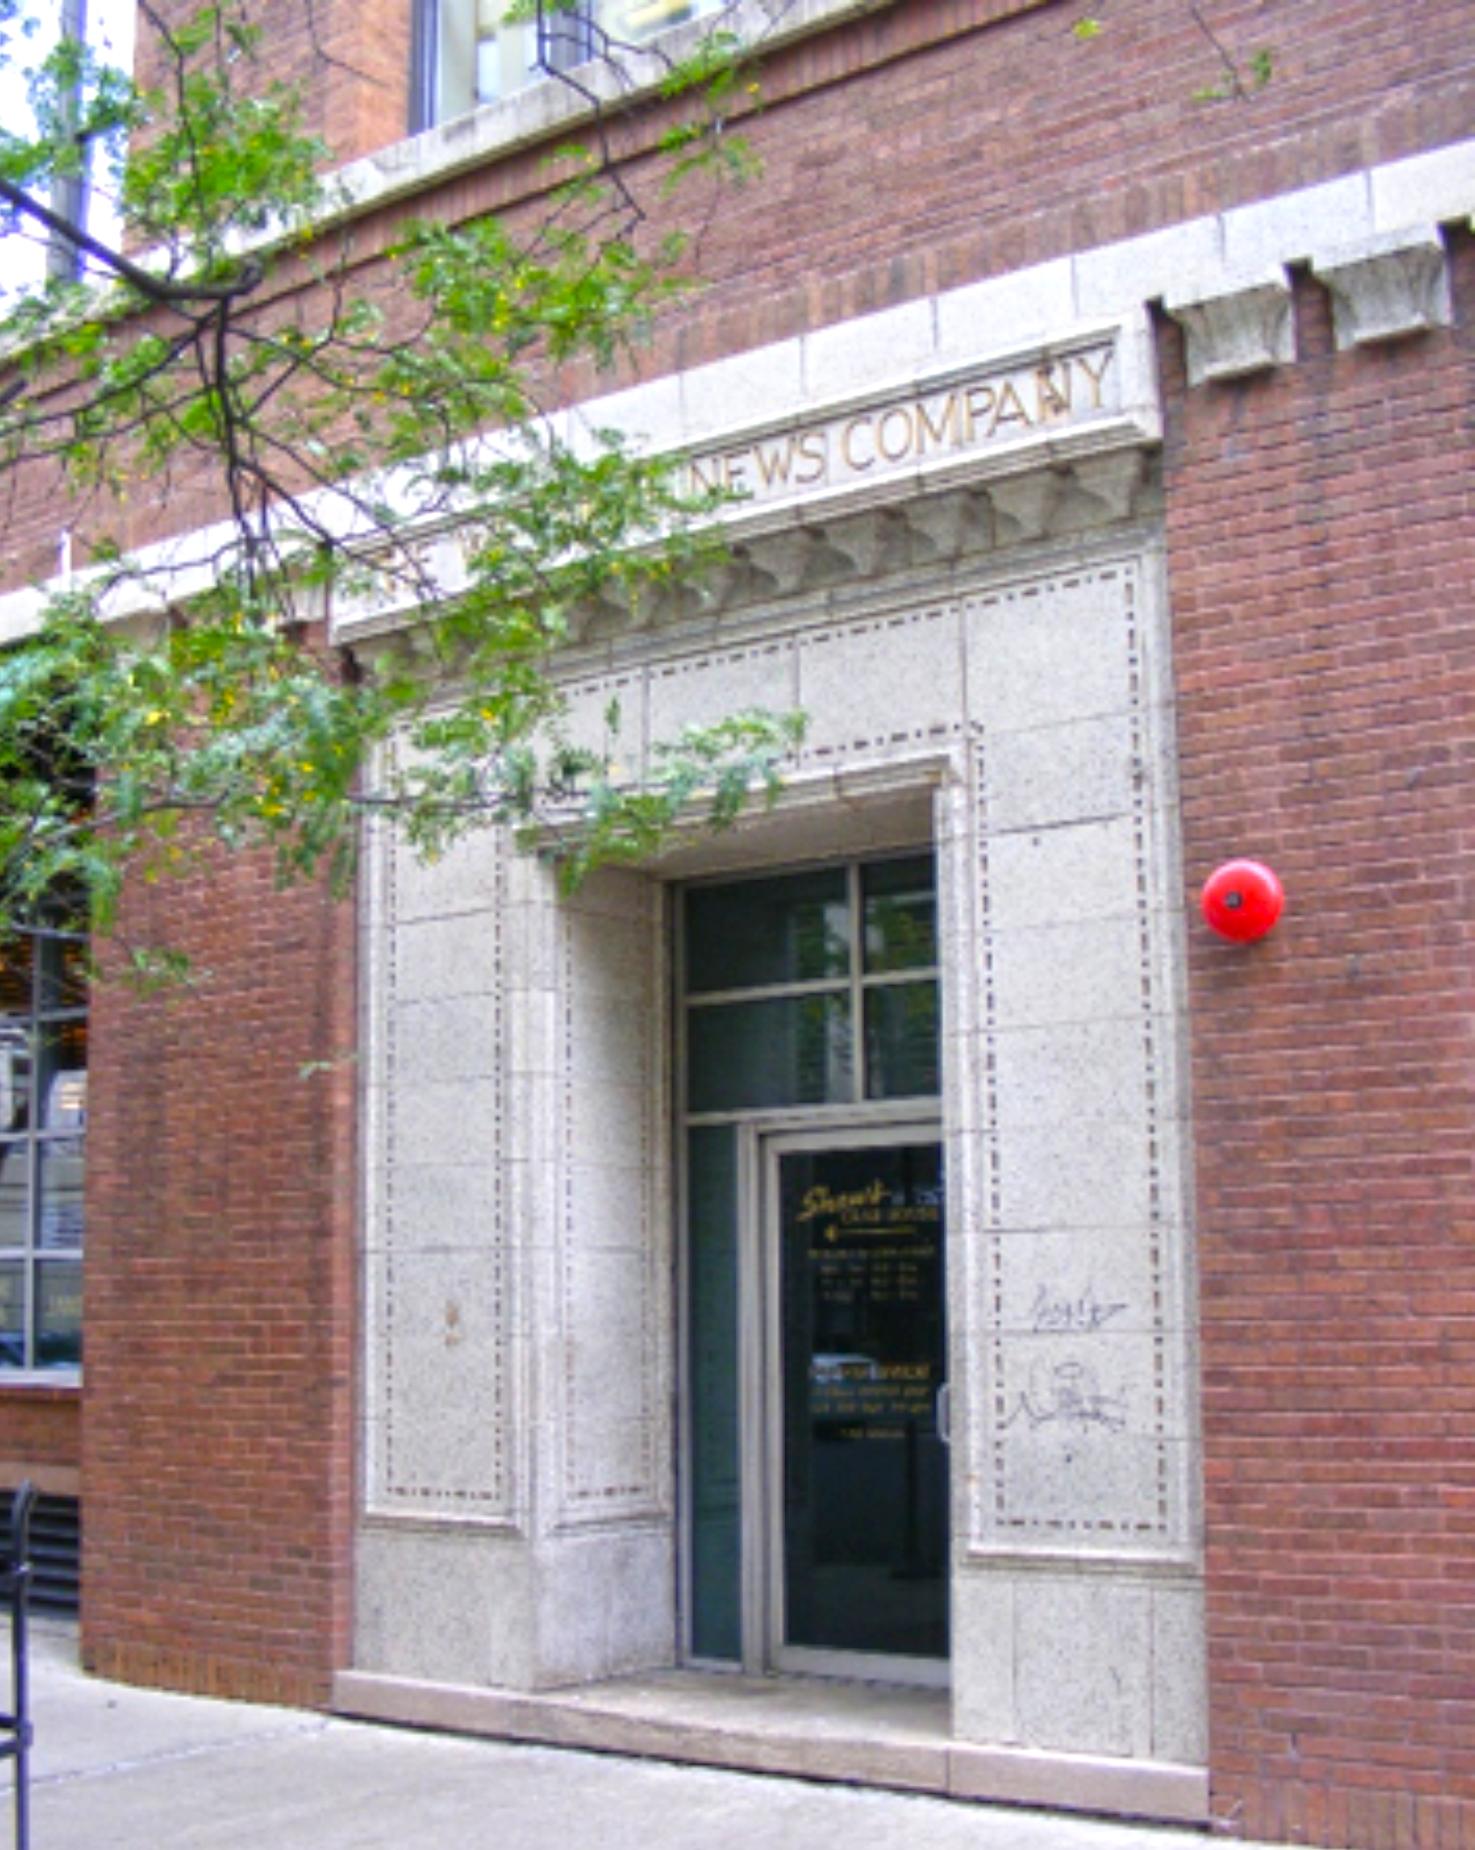 West terra cotta entrance